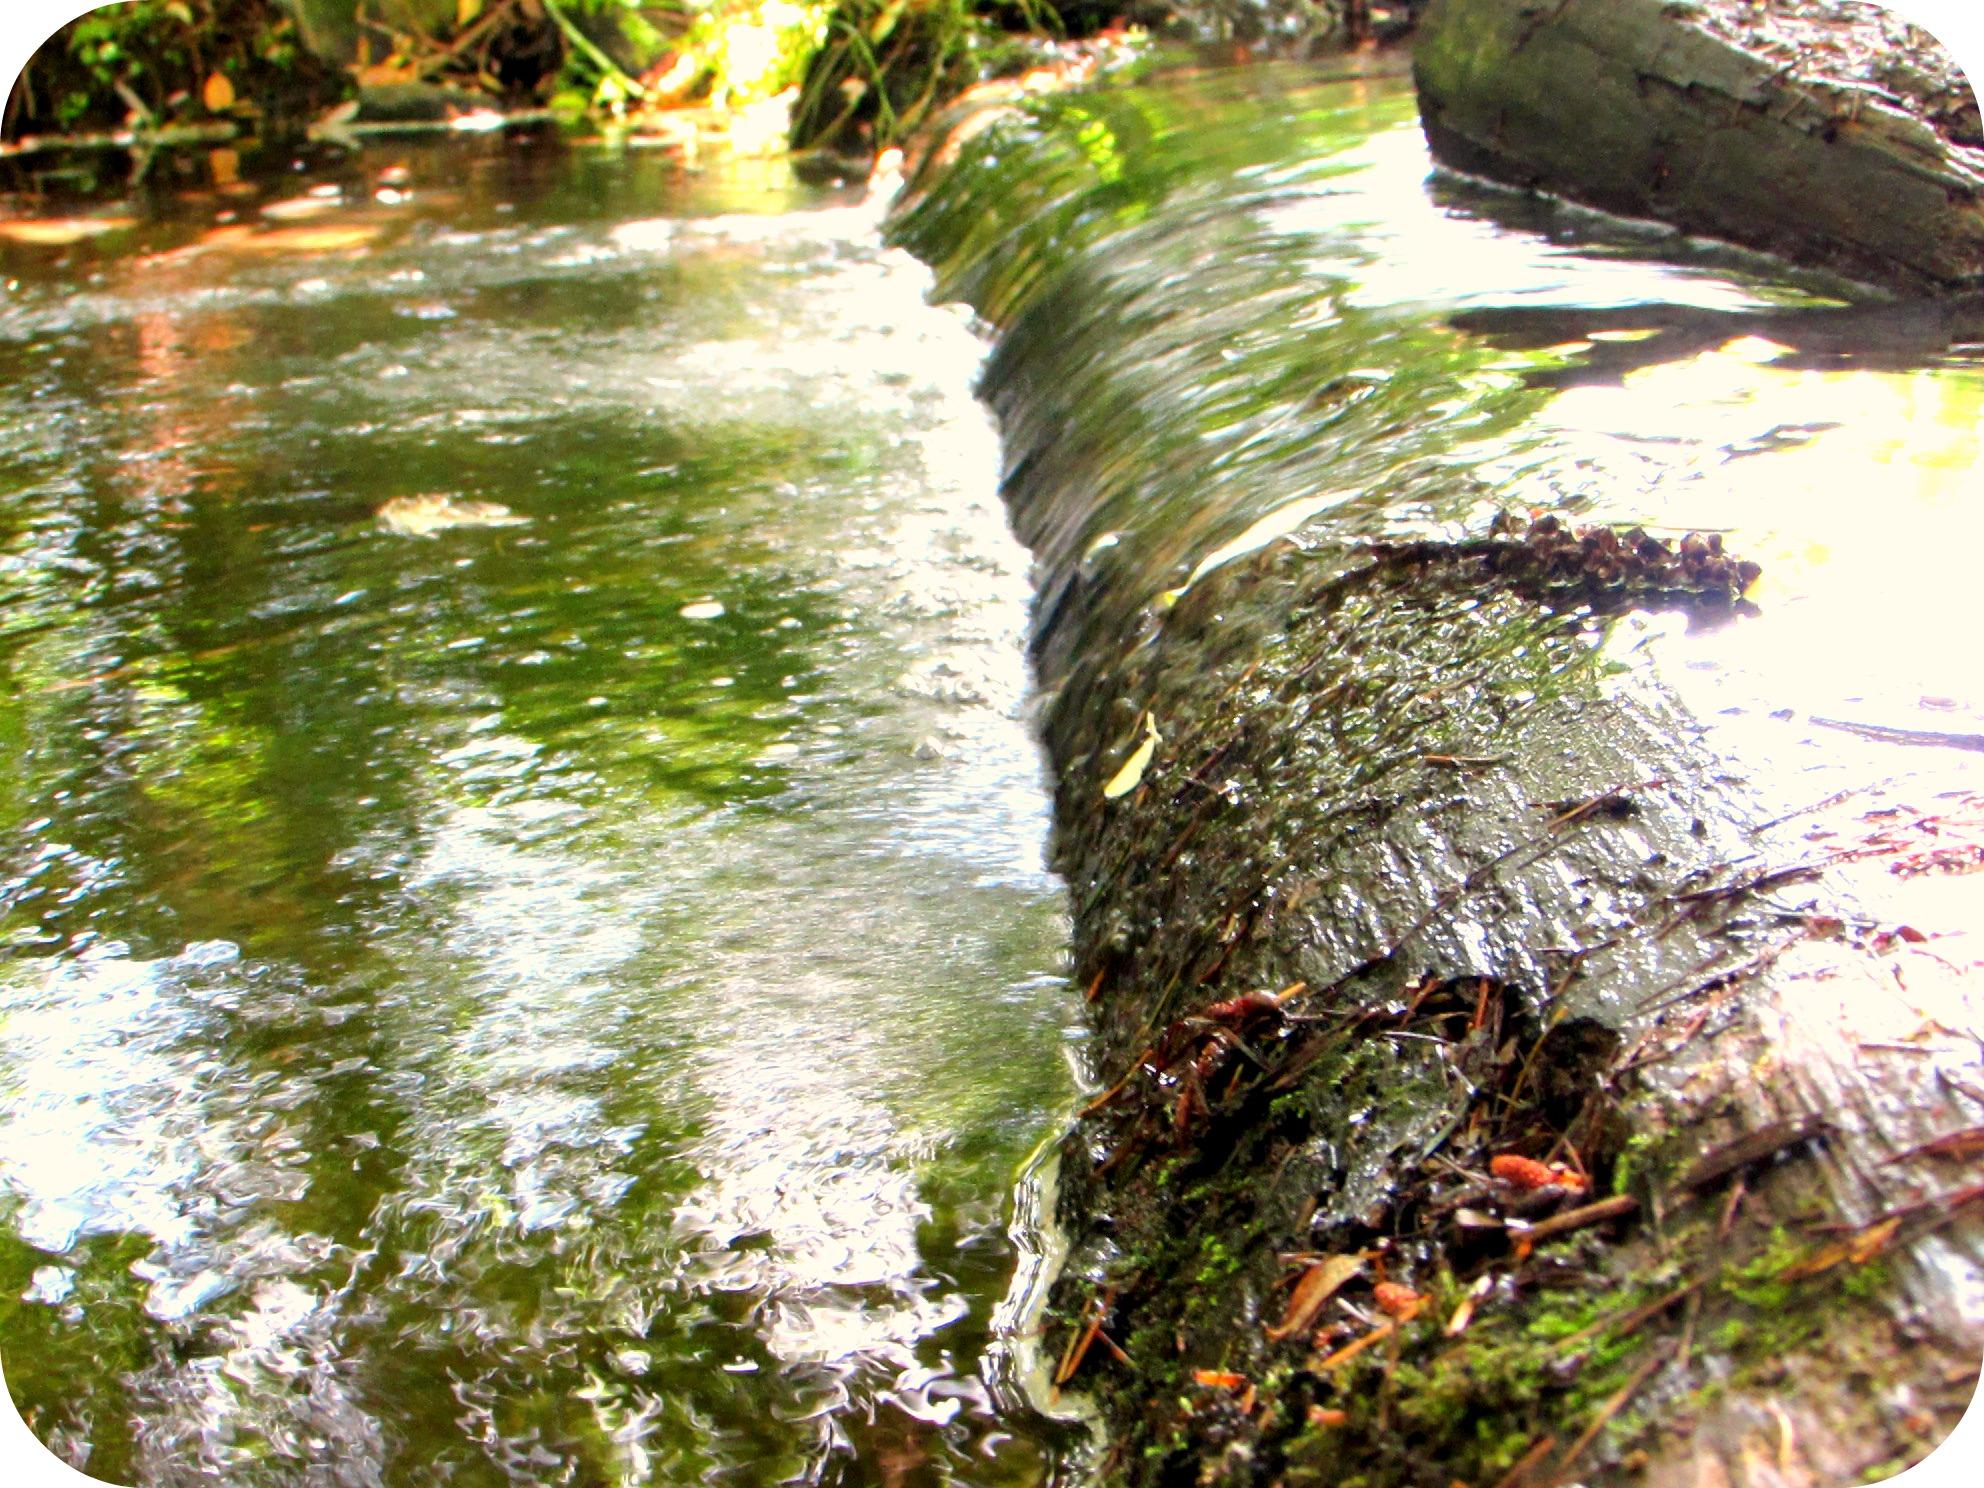 The rushing waters of Hamm Creek